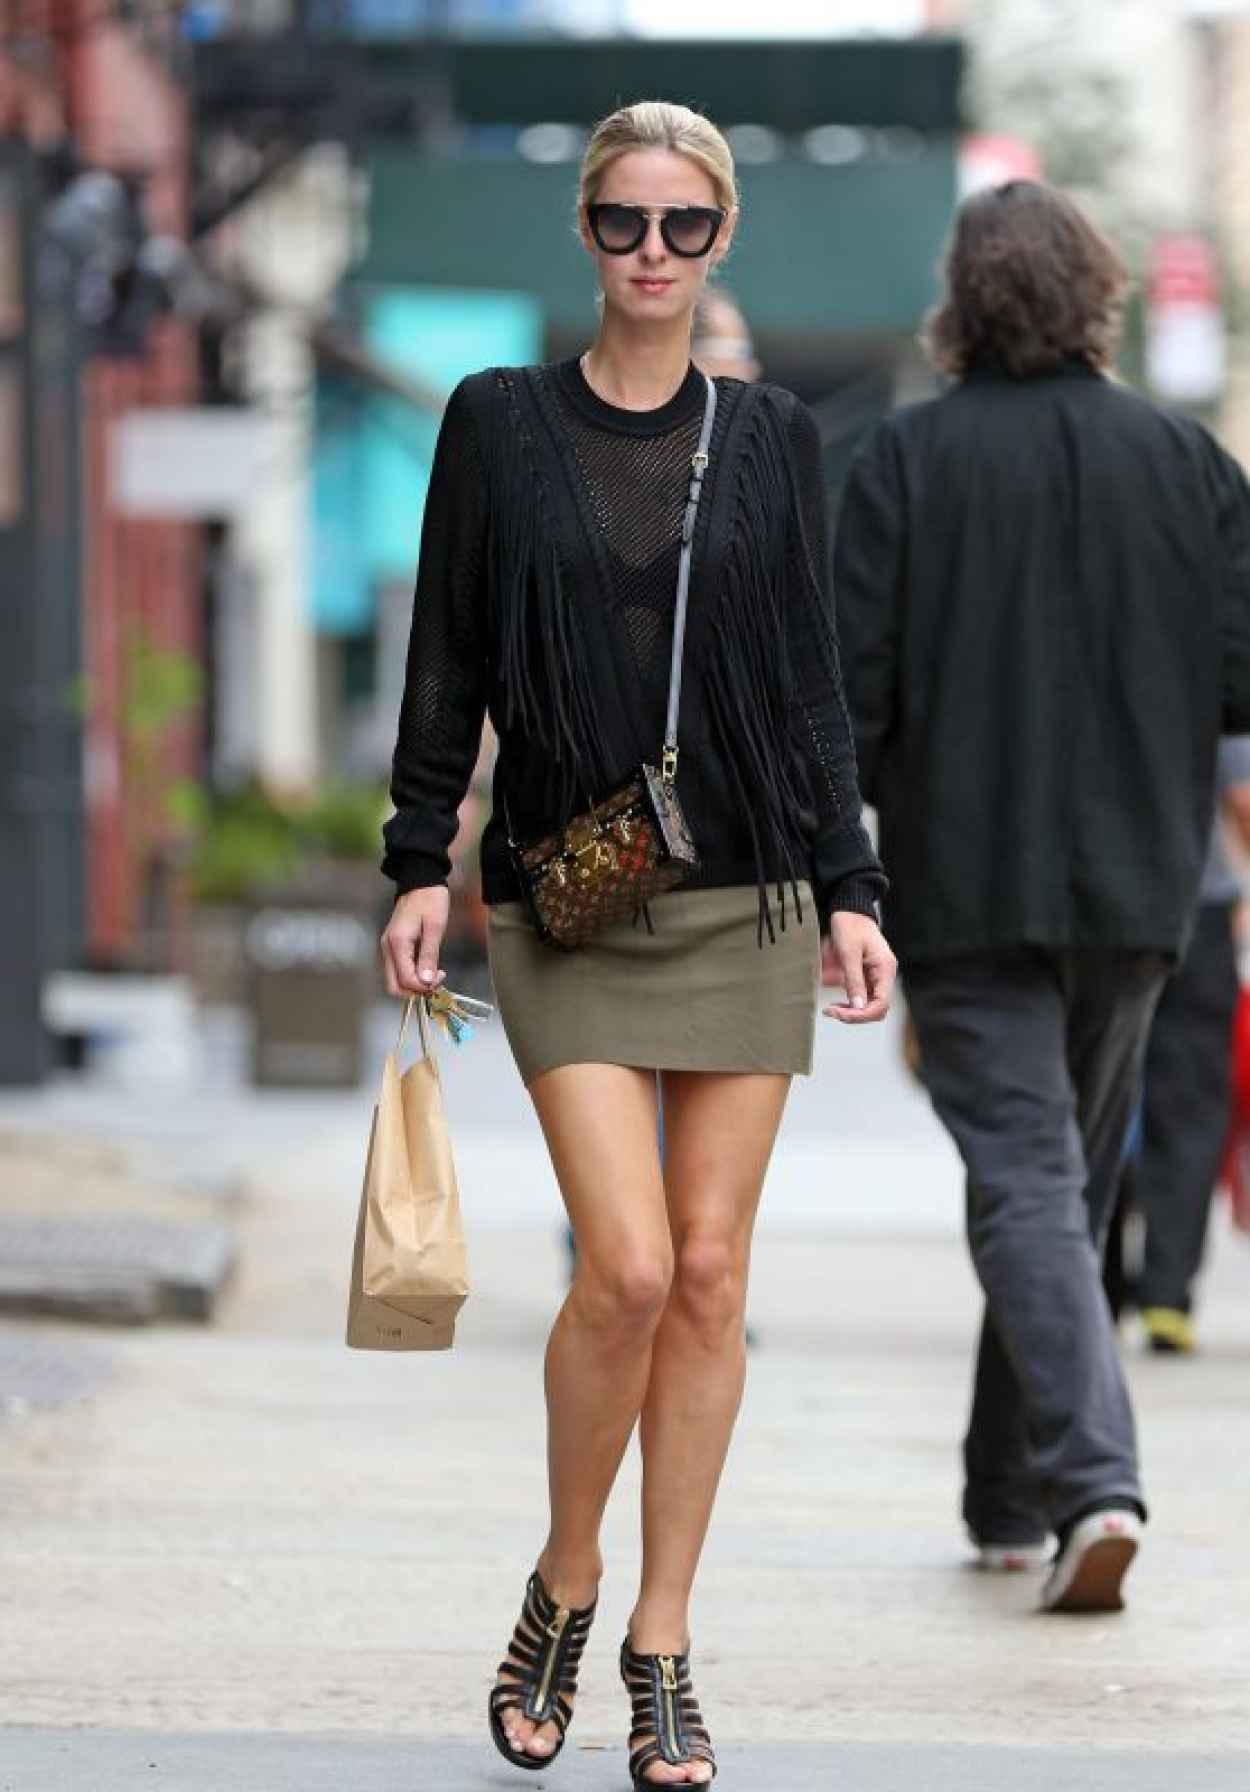 Nicky Hilton Leggy in Mini Skirt - Shopping in NYC, October 2015-1